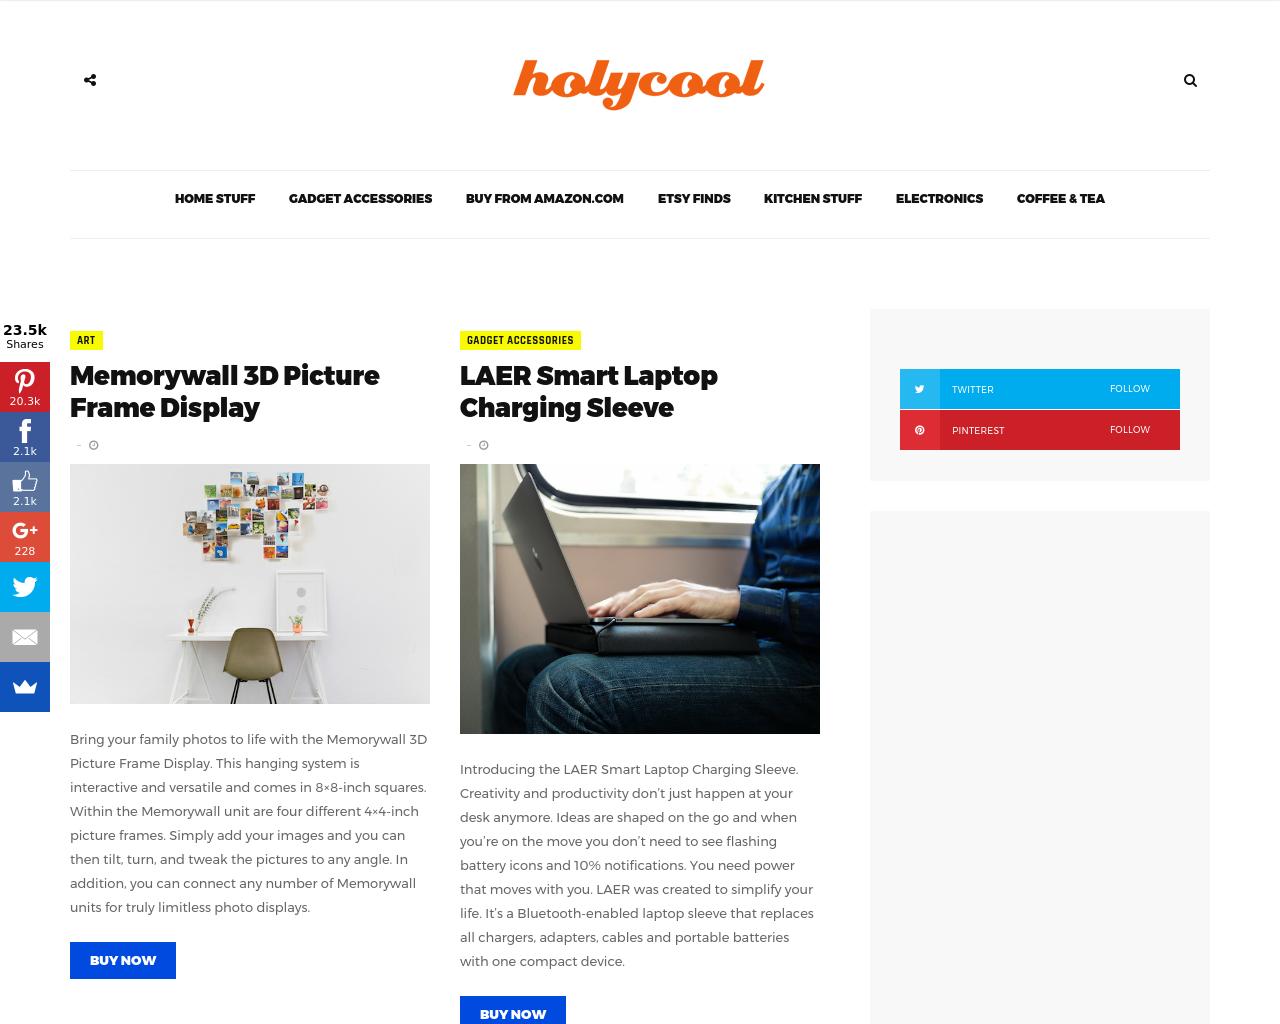 Holycool-Advertising-Reviews-Pricing